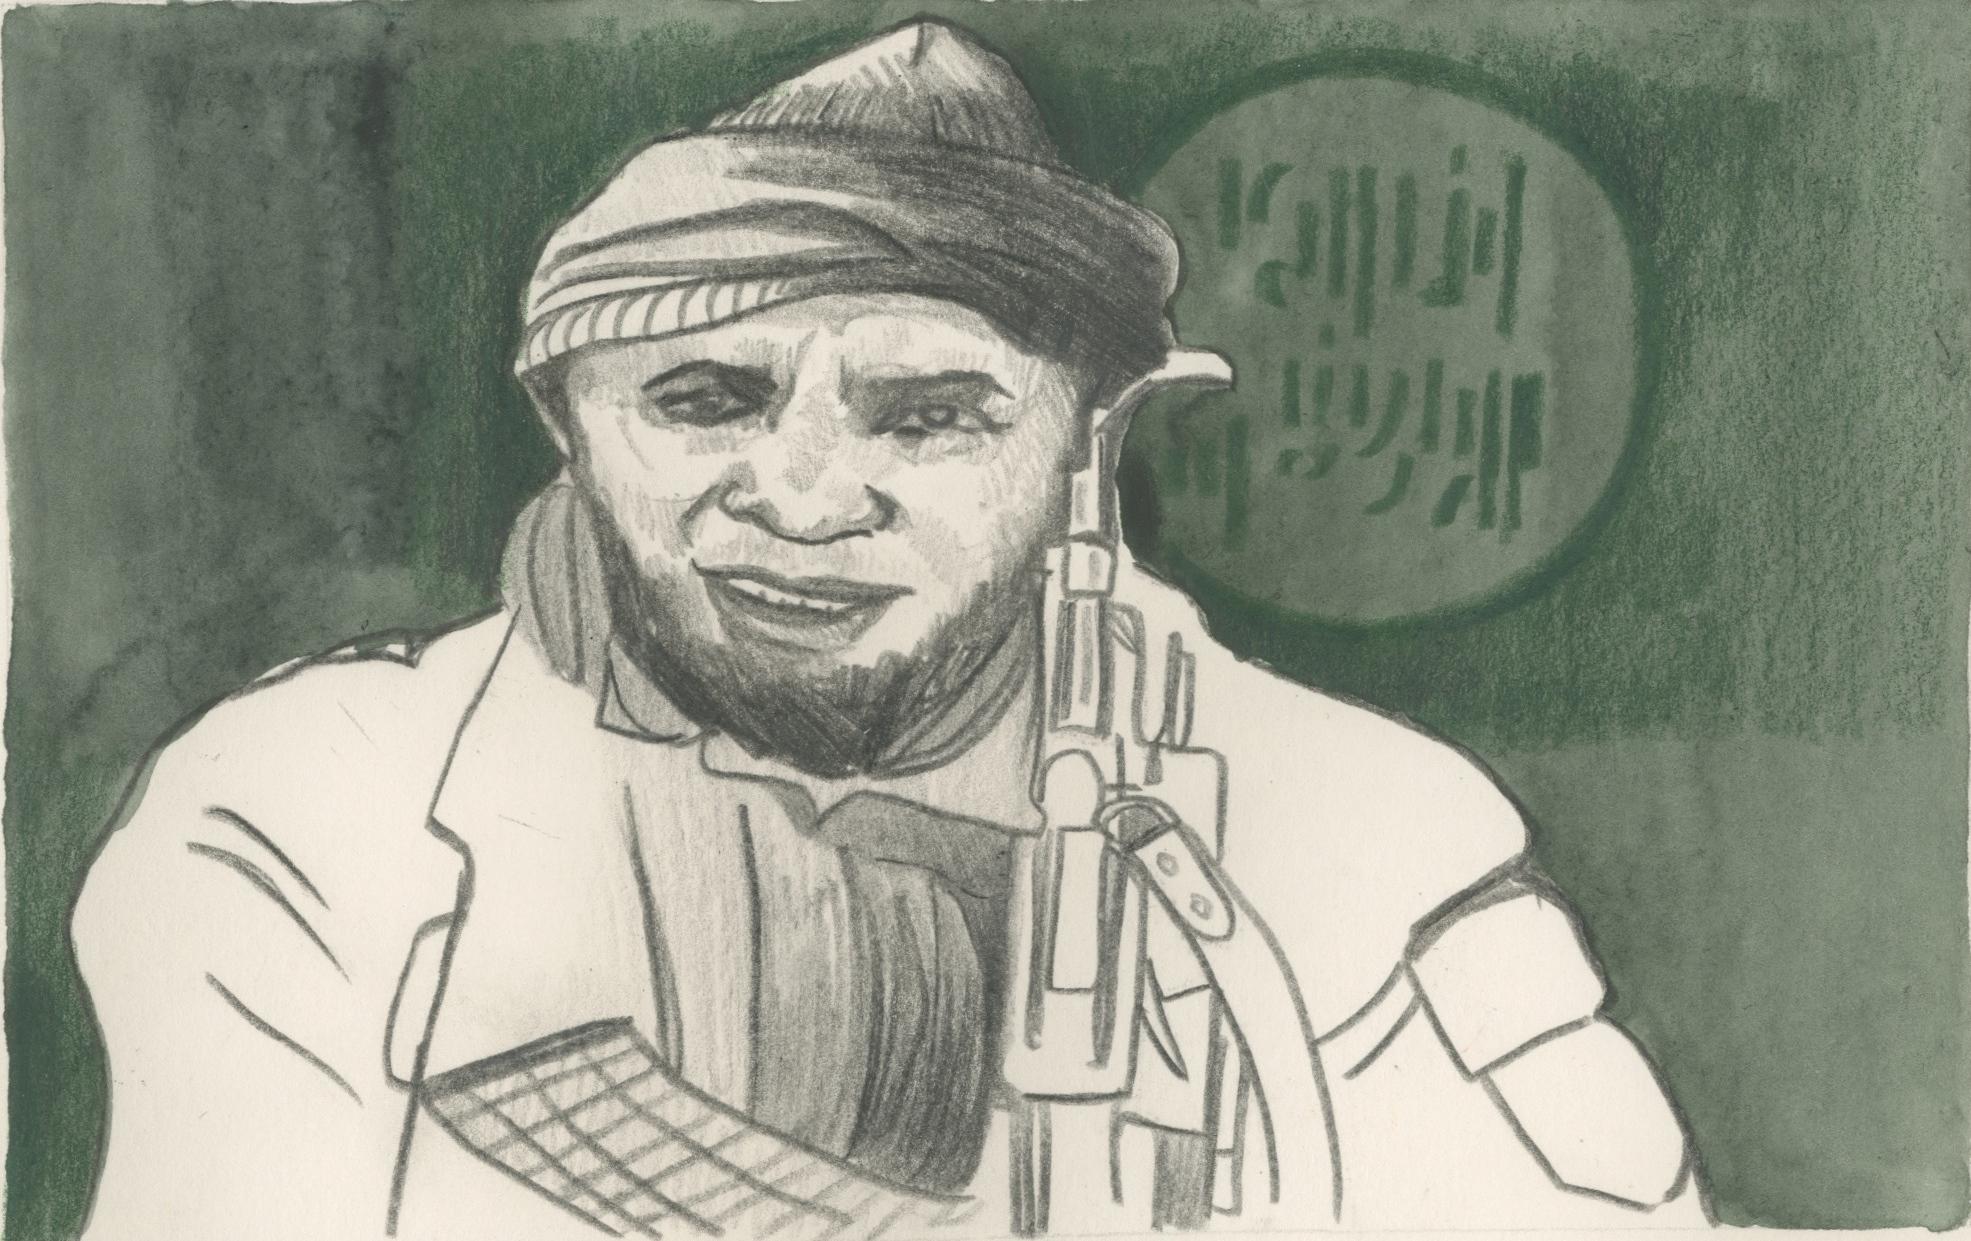 10/01/15 Abubakar Shekau, leader of Boku Haram, the militant Islamic group which murdered over 2,000 people in Northern Nigeria